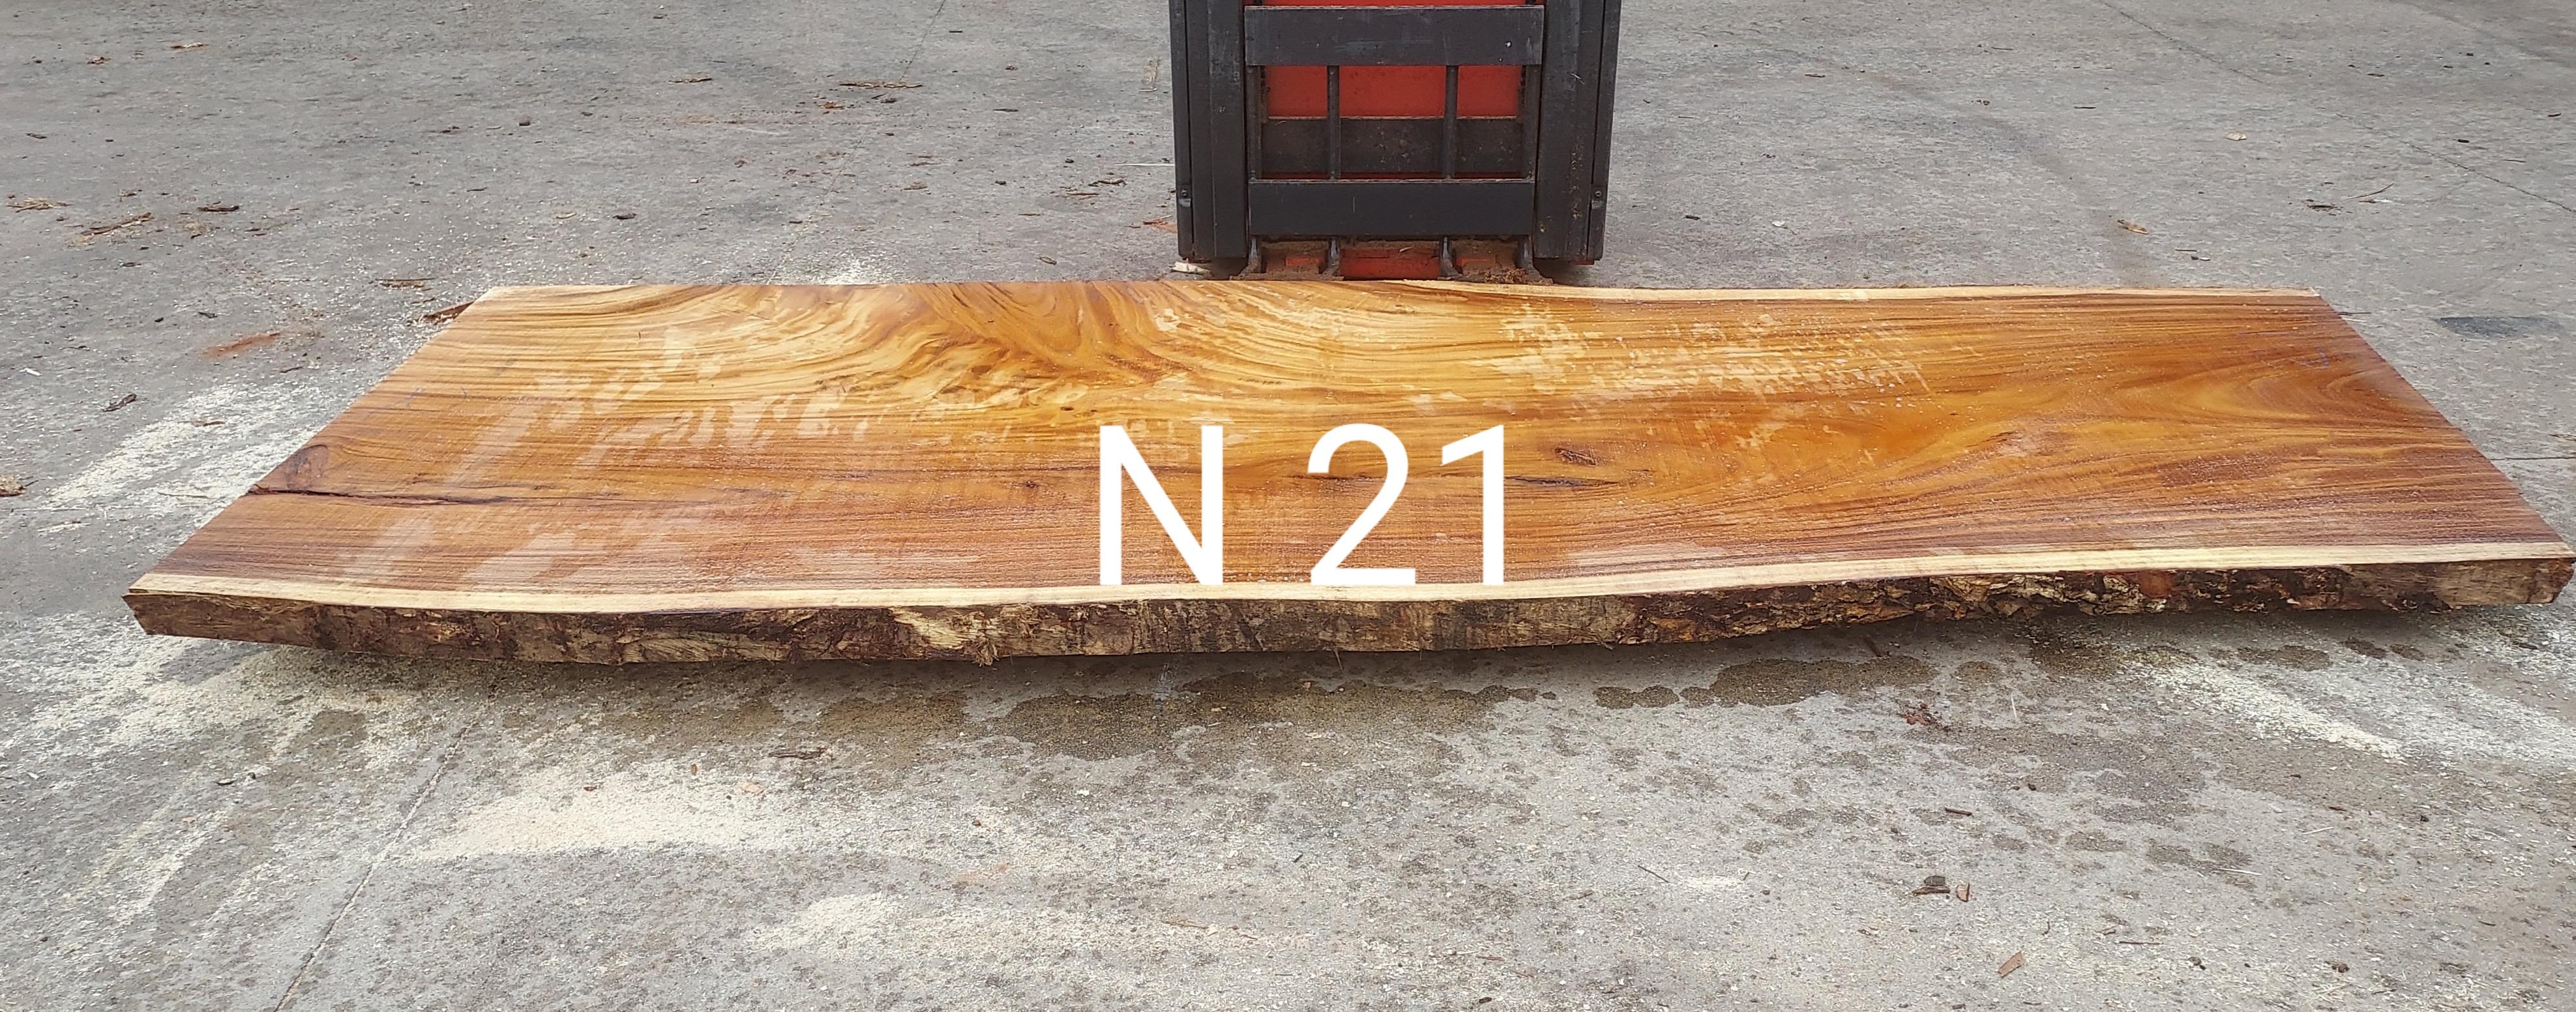 N 21 ANCHO